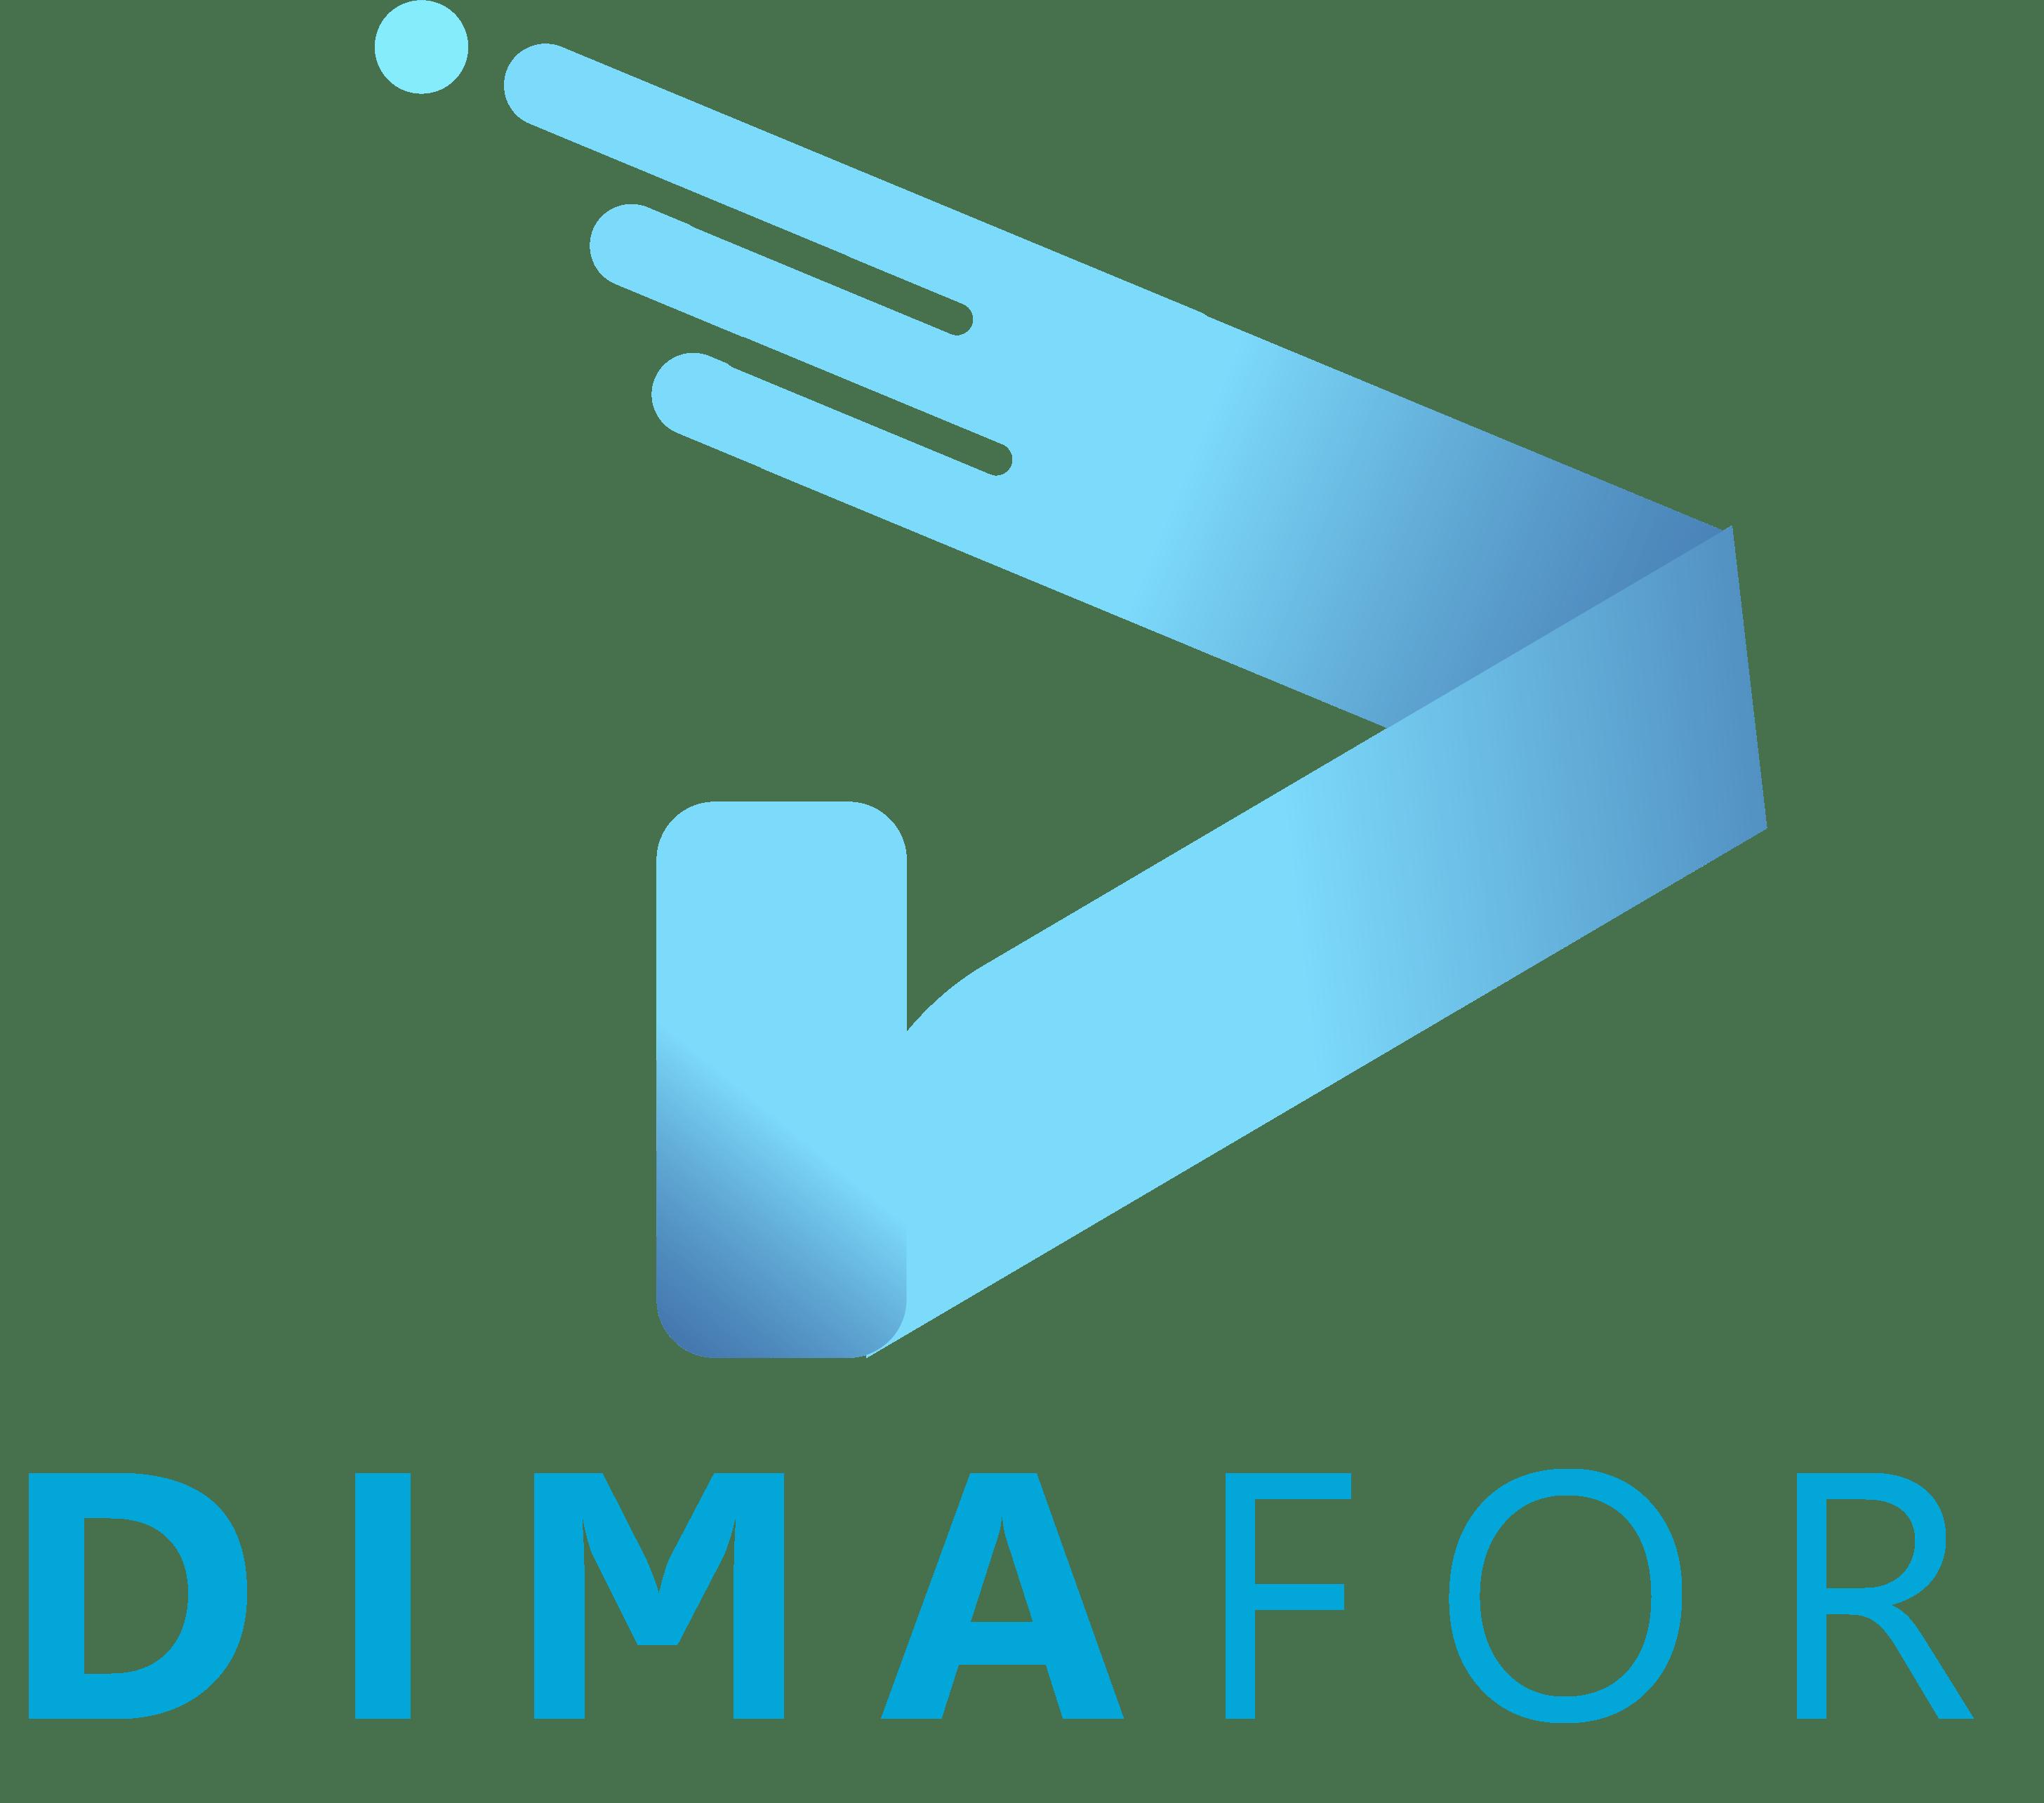 Dimafor